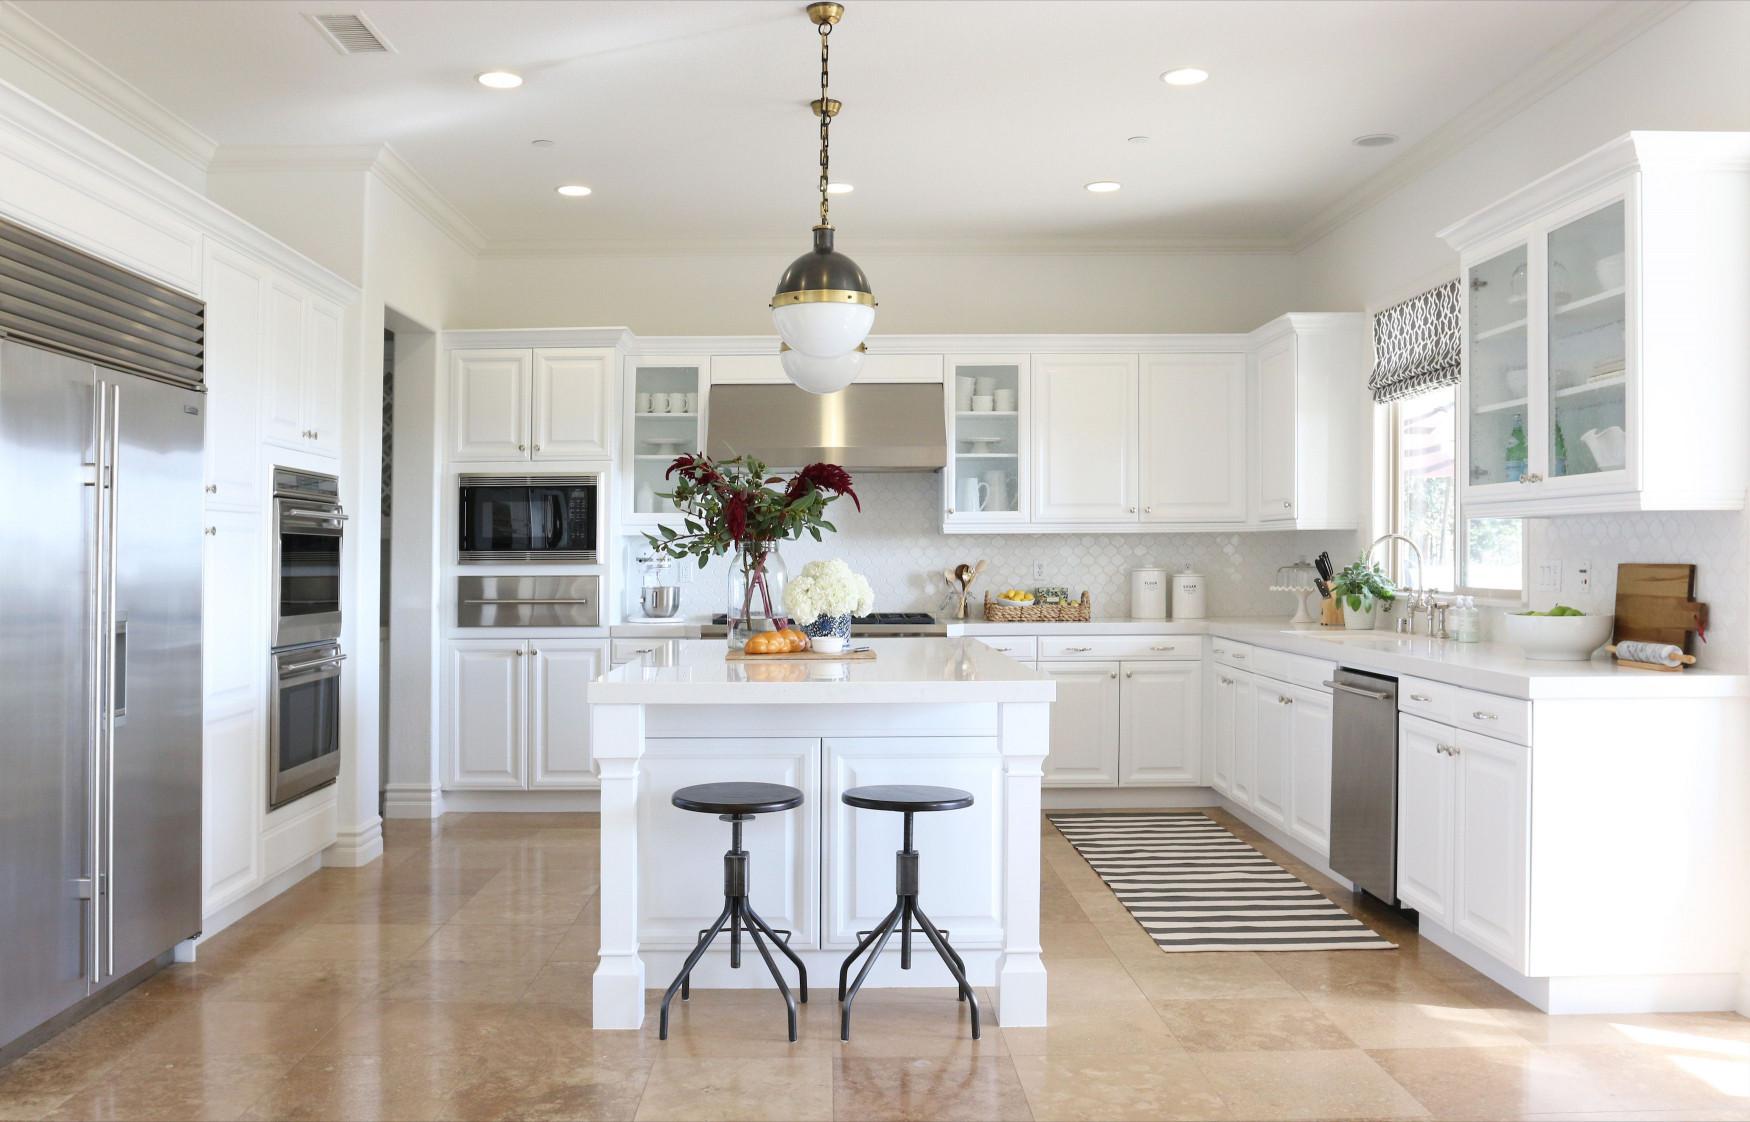 White Kitchen Cabinet Fresh 14 Best White Kitchen Cabinets Design Ideas for White Cabinets